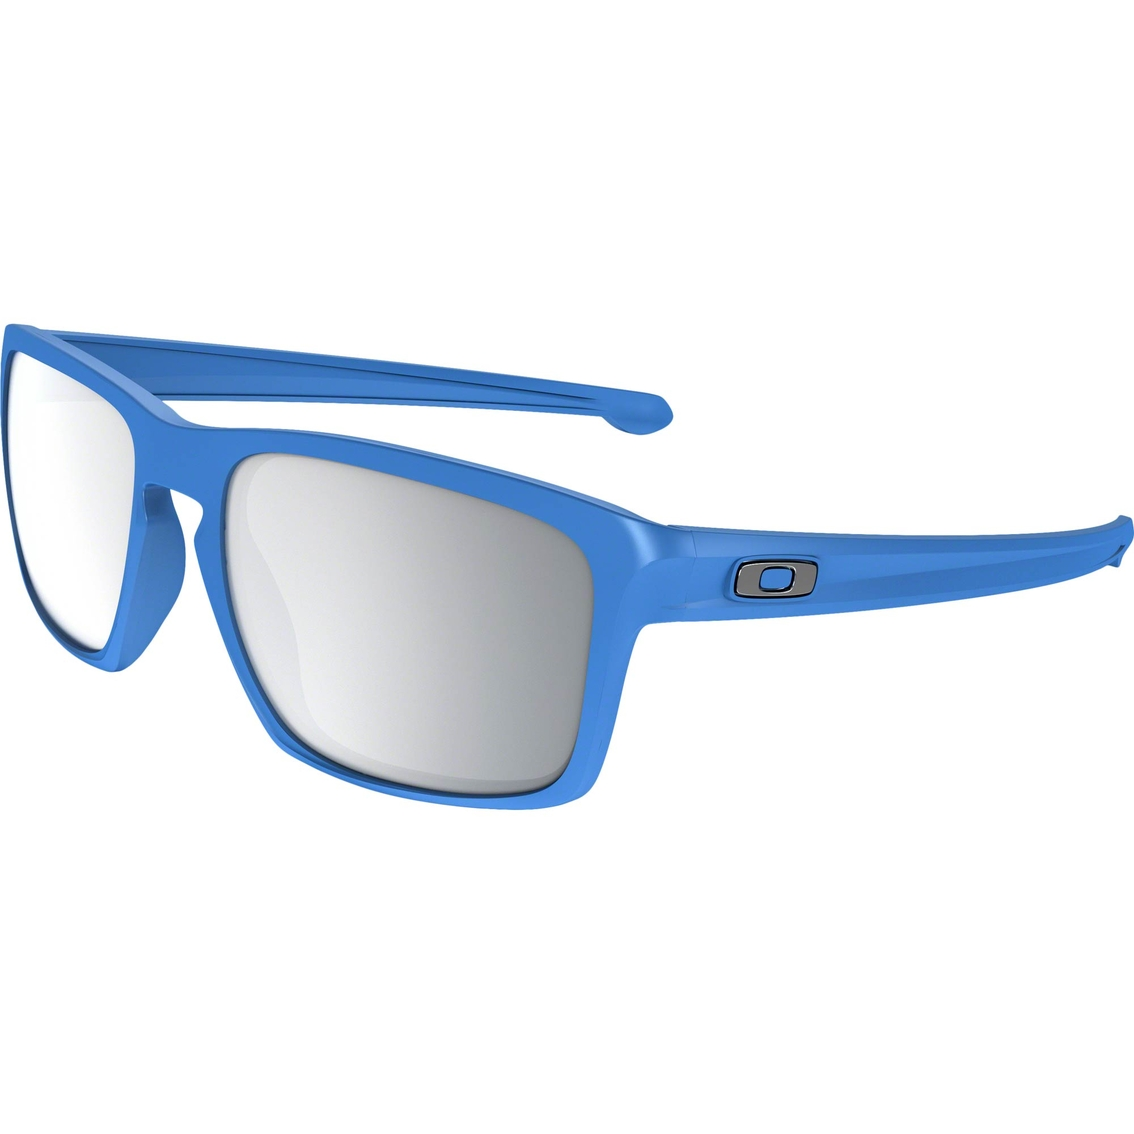 47eb80f232b Oakley Sliver O Matter Rectangle Chrome Iridium Sunglasses